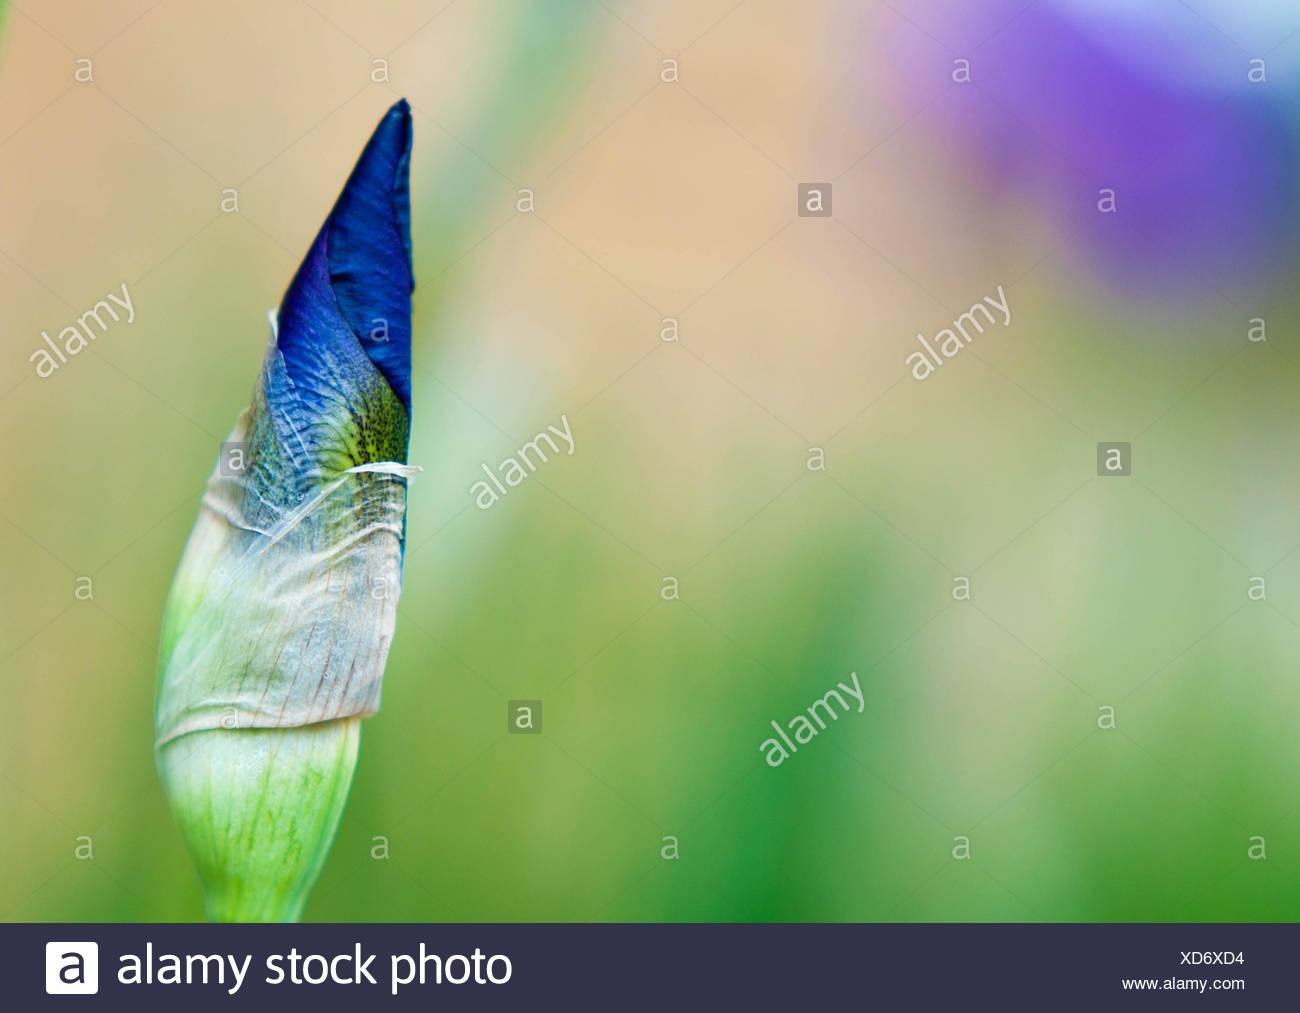 Close-up of Iris flower, Indiana, America, USA - Stock Image